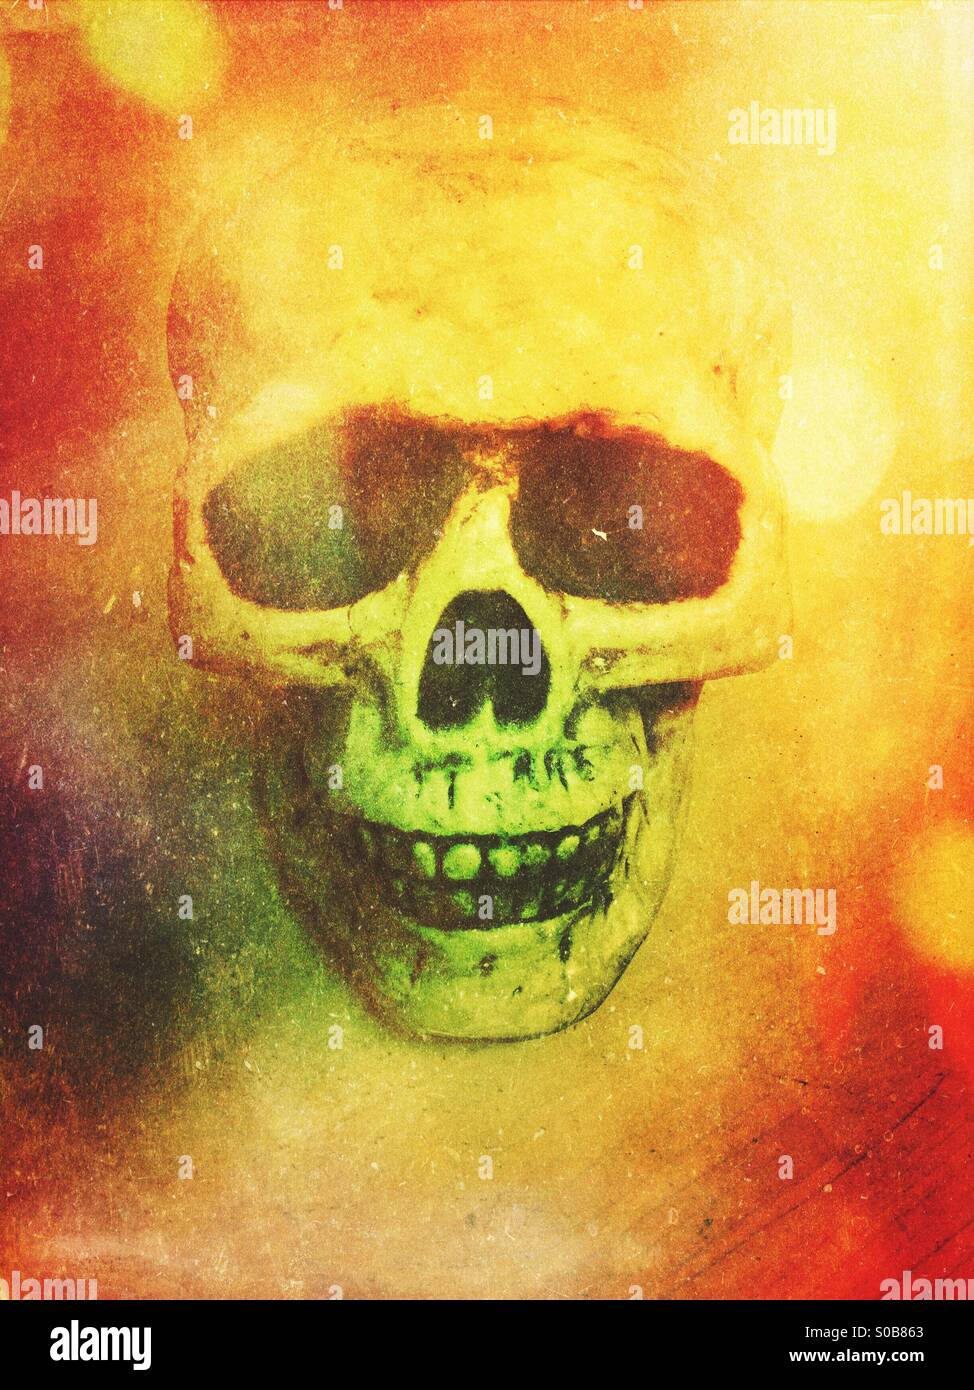 Skull - Stock Image